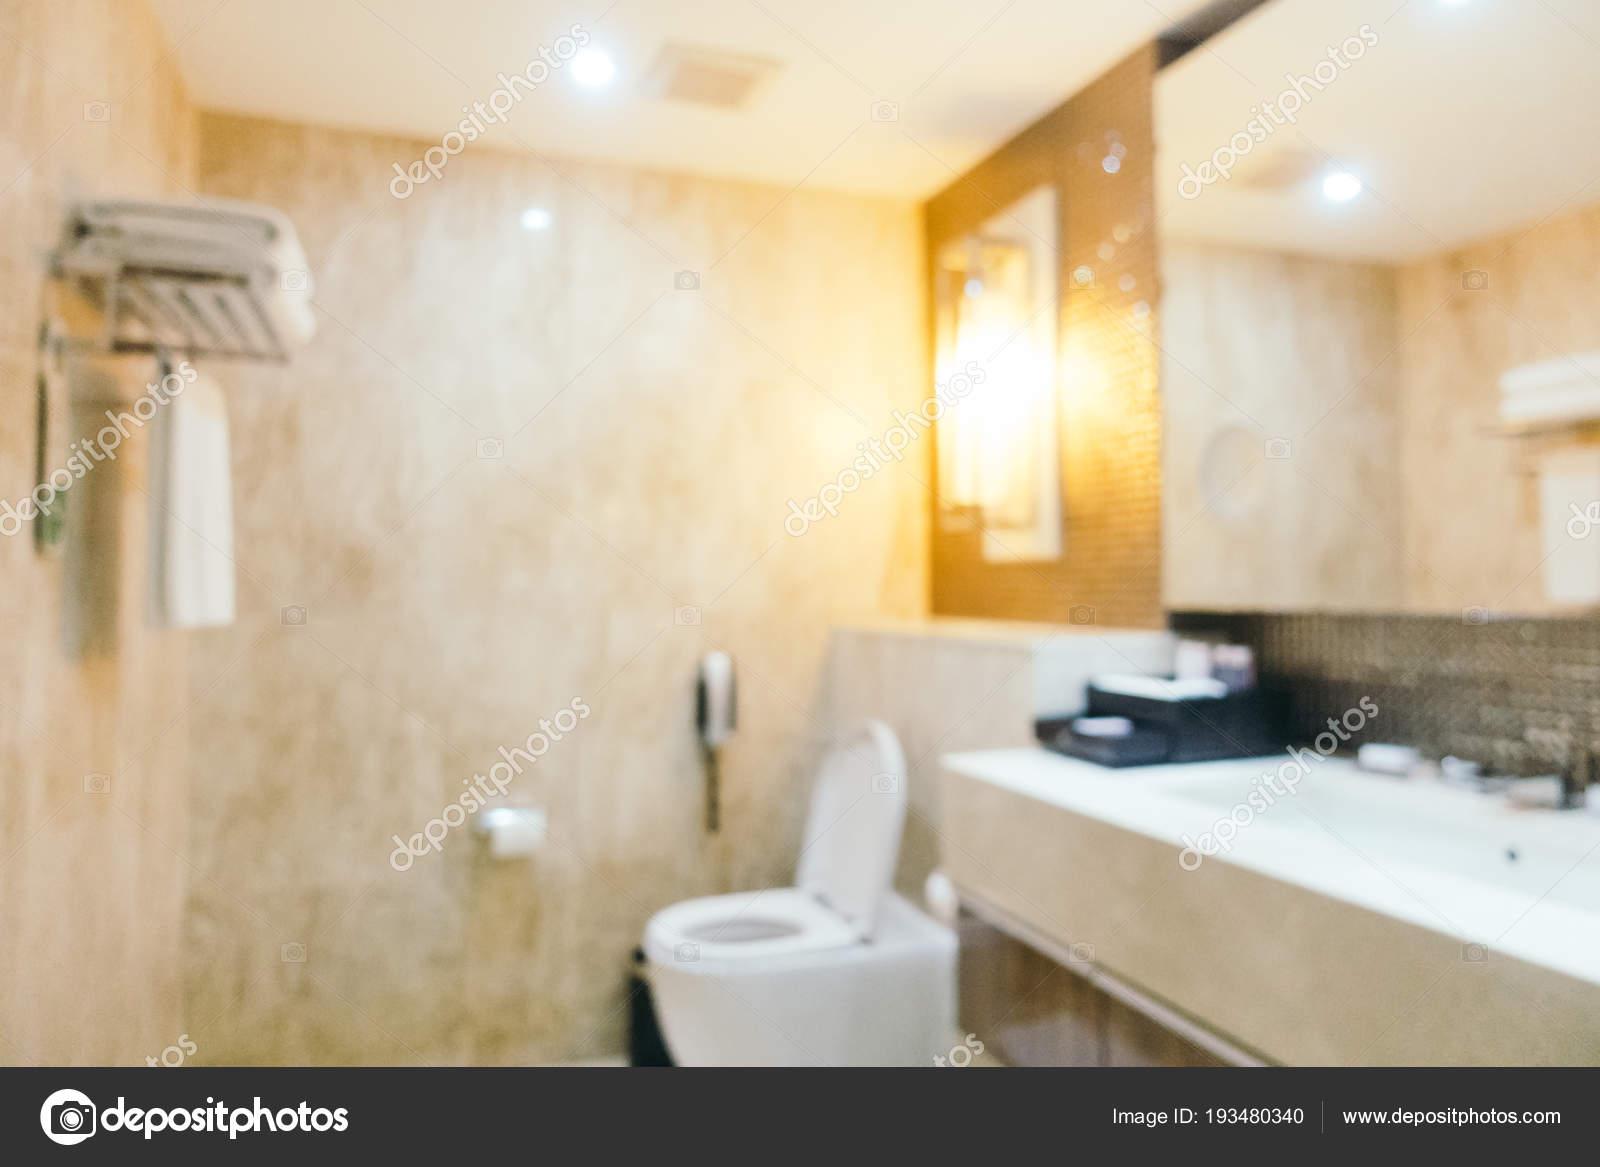 Badkamer En Toilet : Abstract vervagen badkamer en toilet interieur u stockfoto